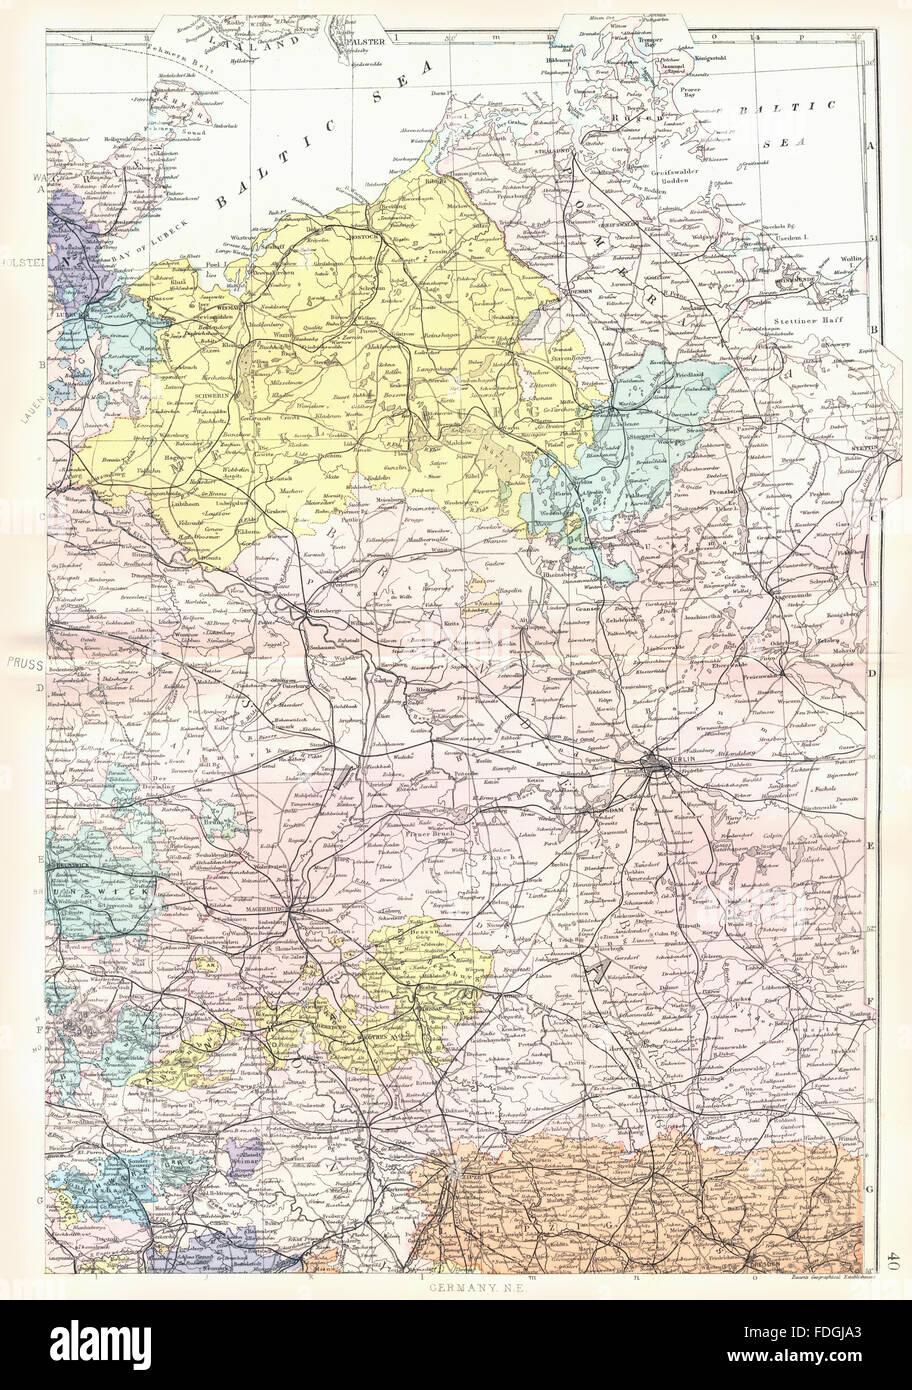 Mecklenburg Brandenburg